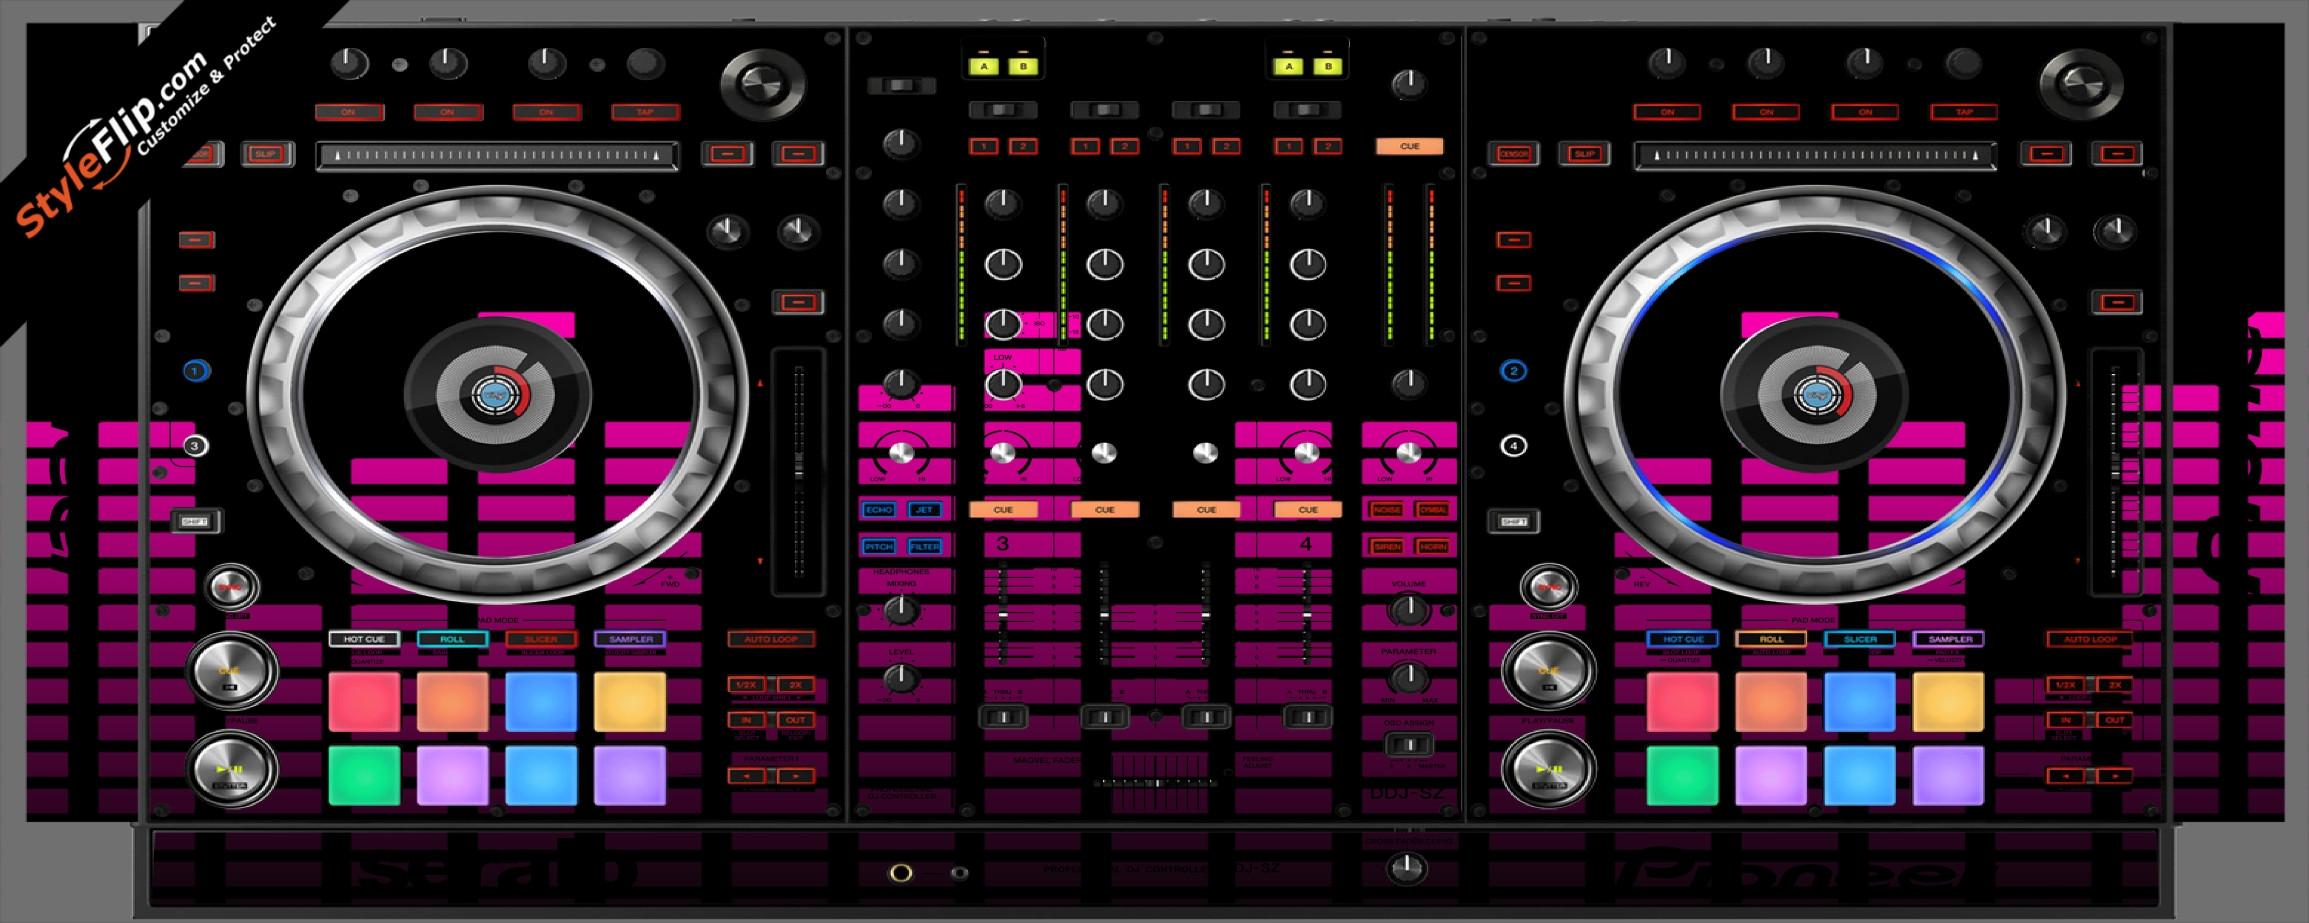 Pink Equalizer Pioneer DDJ-SZ